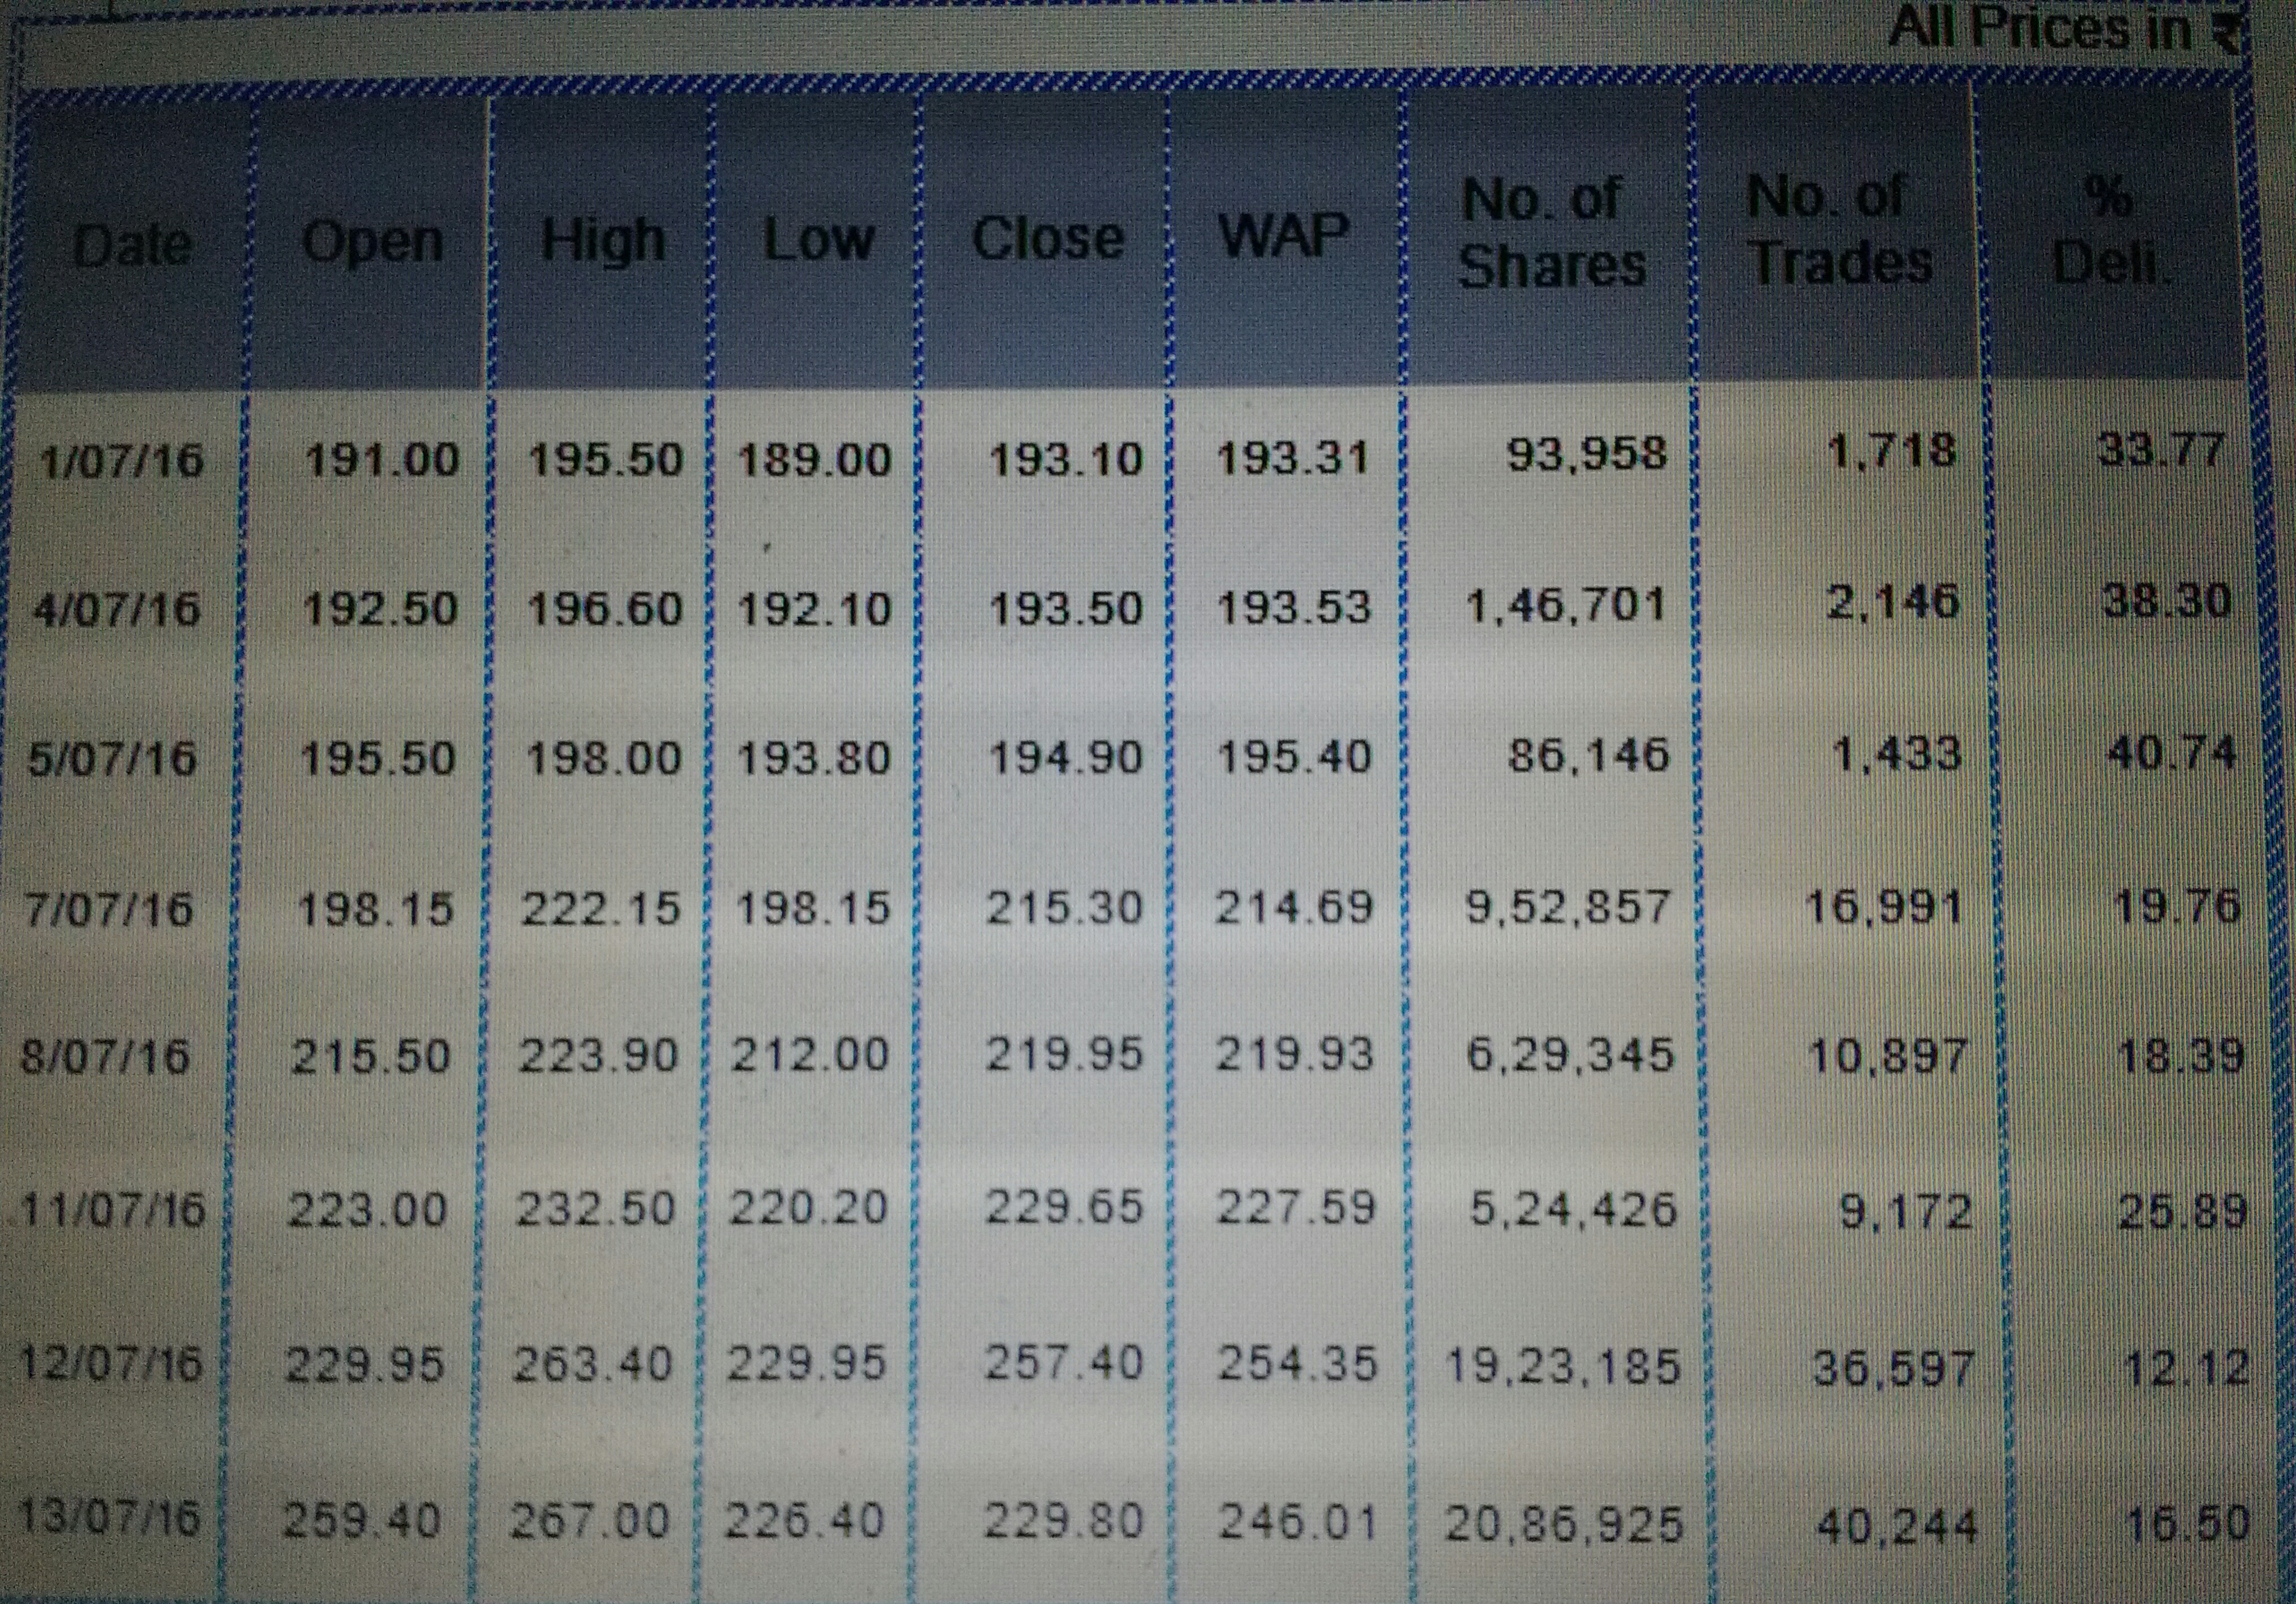 NBCC BSE Trades